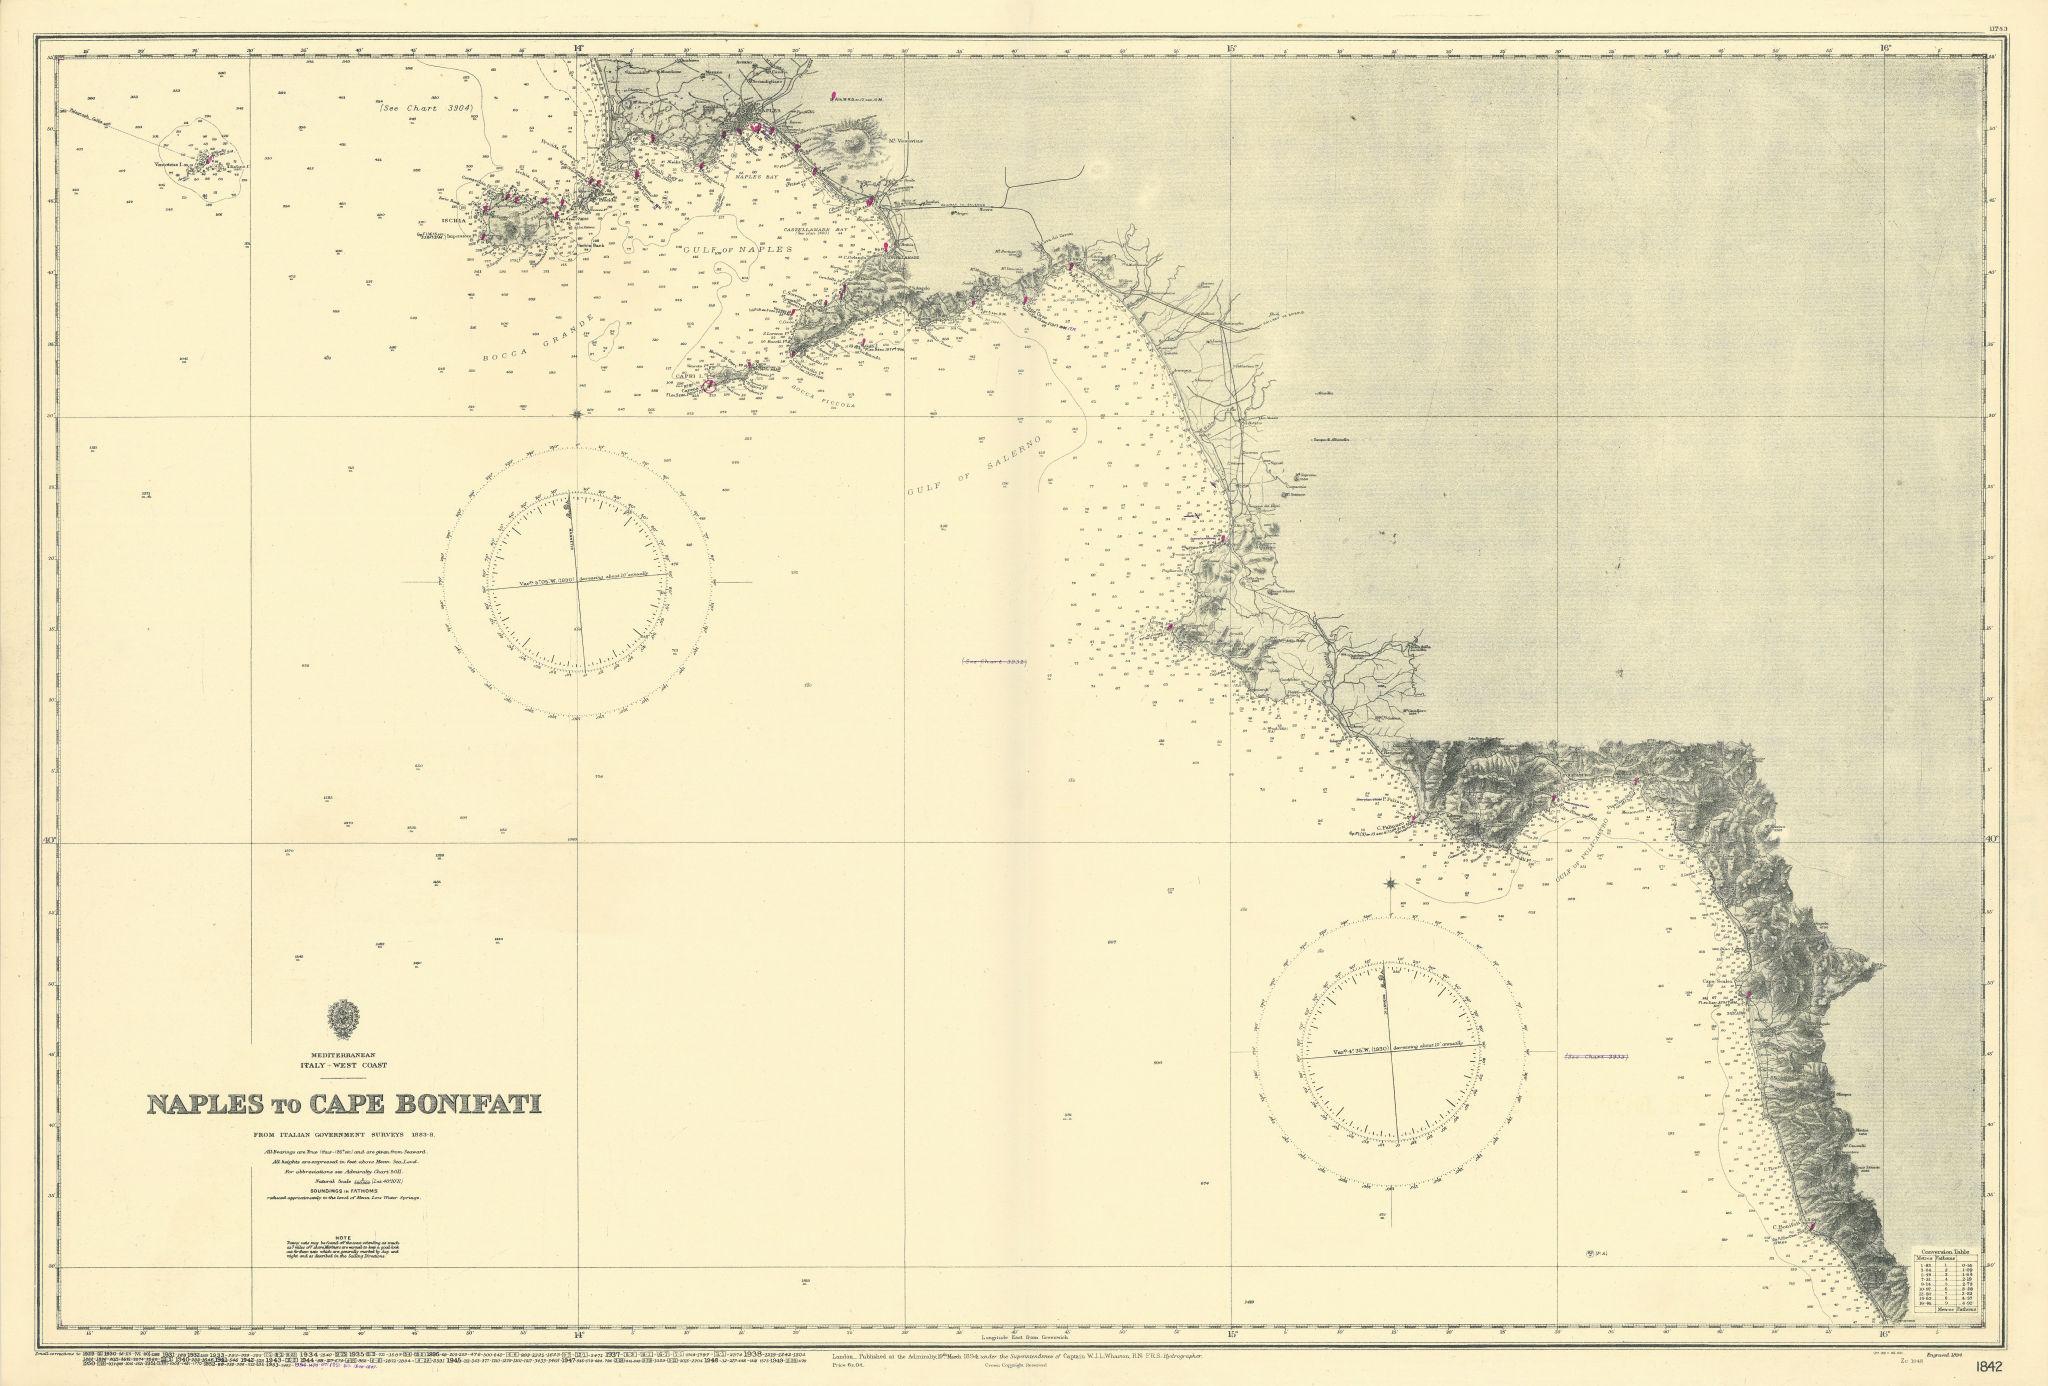 Campania coast. Naples-Cape Bonifati. Italy. ADMIRALTY sea chart 1894 (1955) map